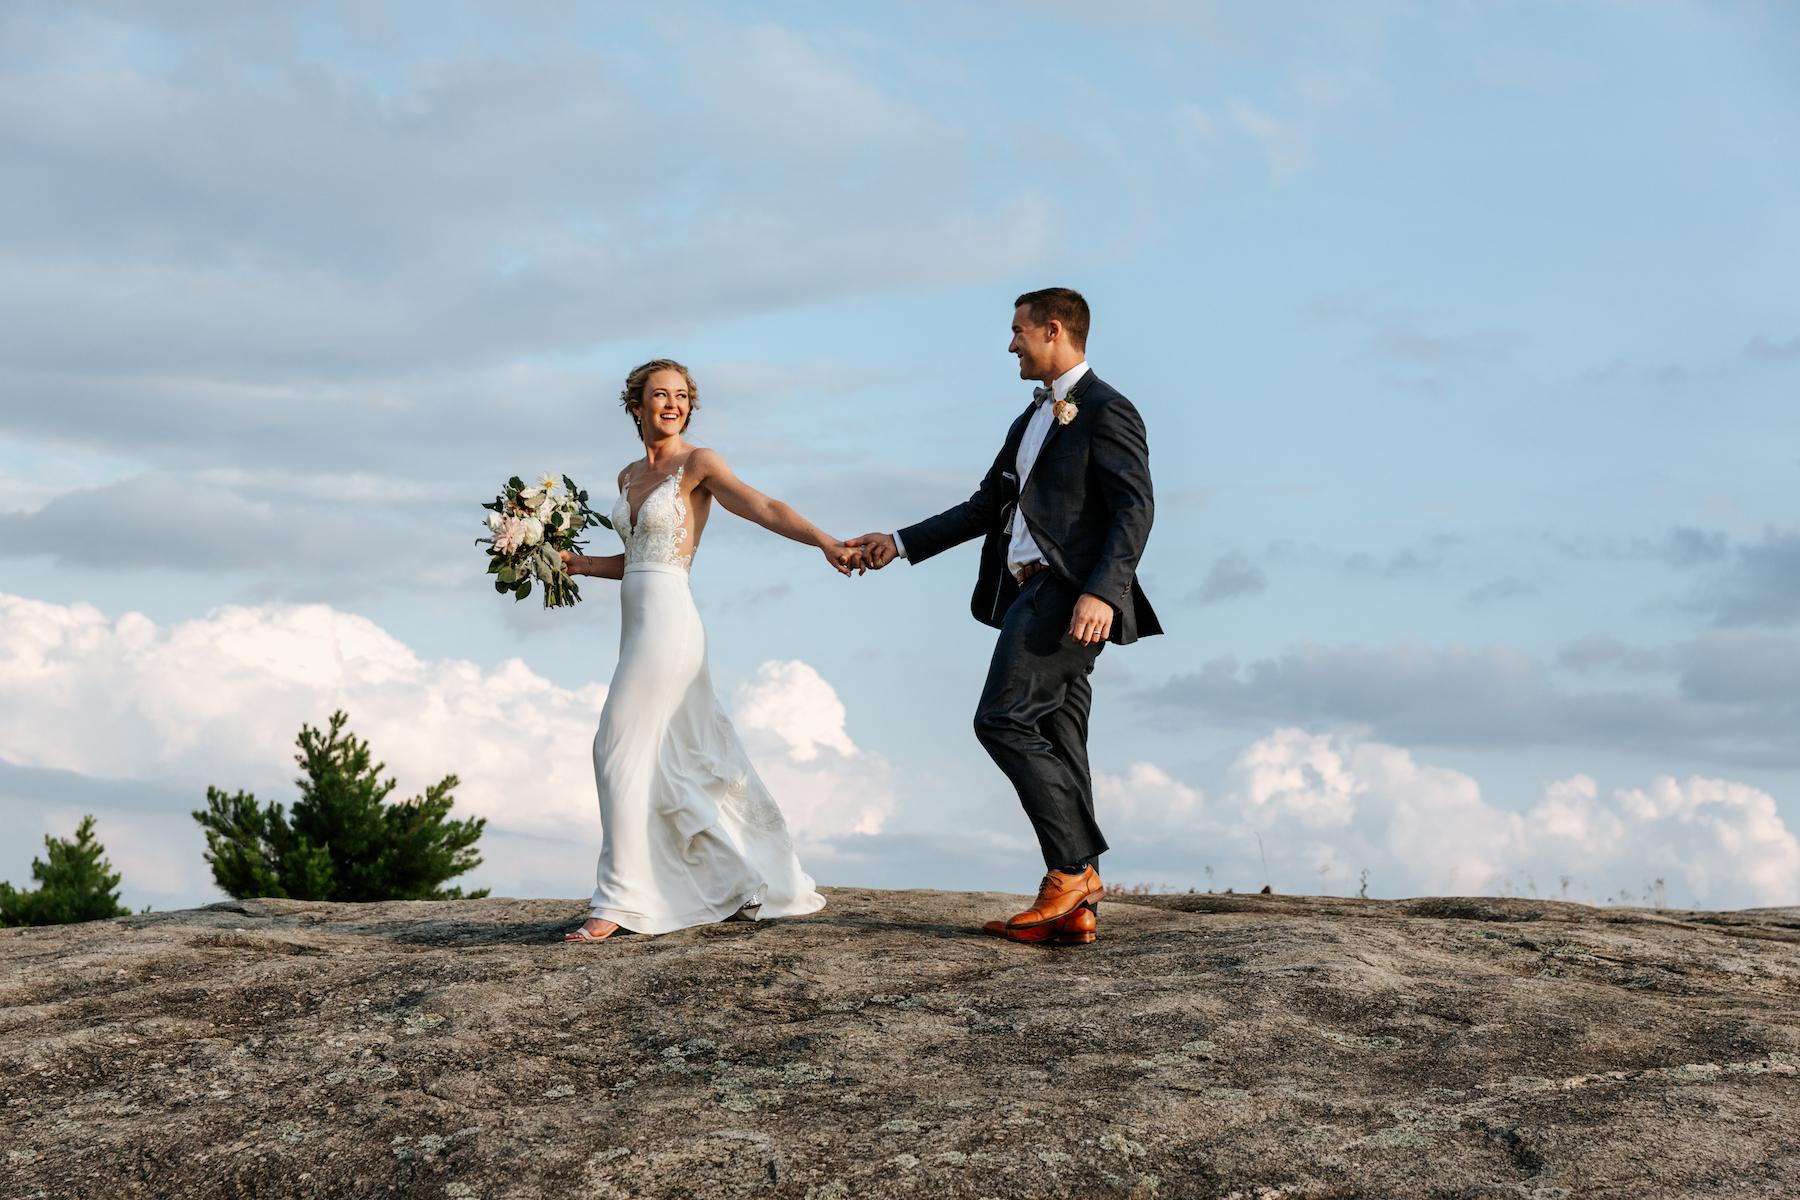 wedding-engagement-photographer-spartanburg-greenville-columbia-carolina-south-north-533.JPG